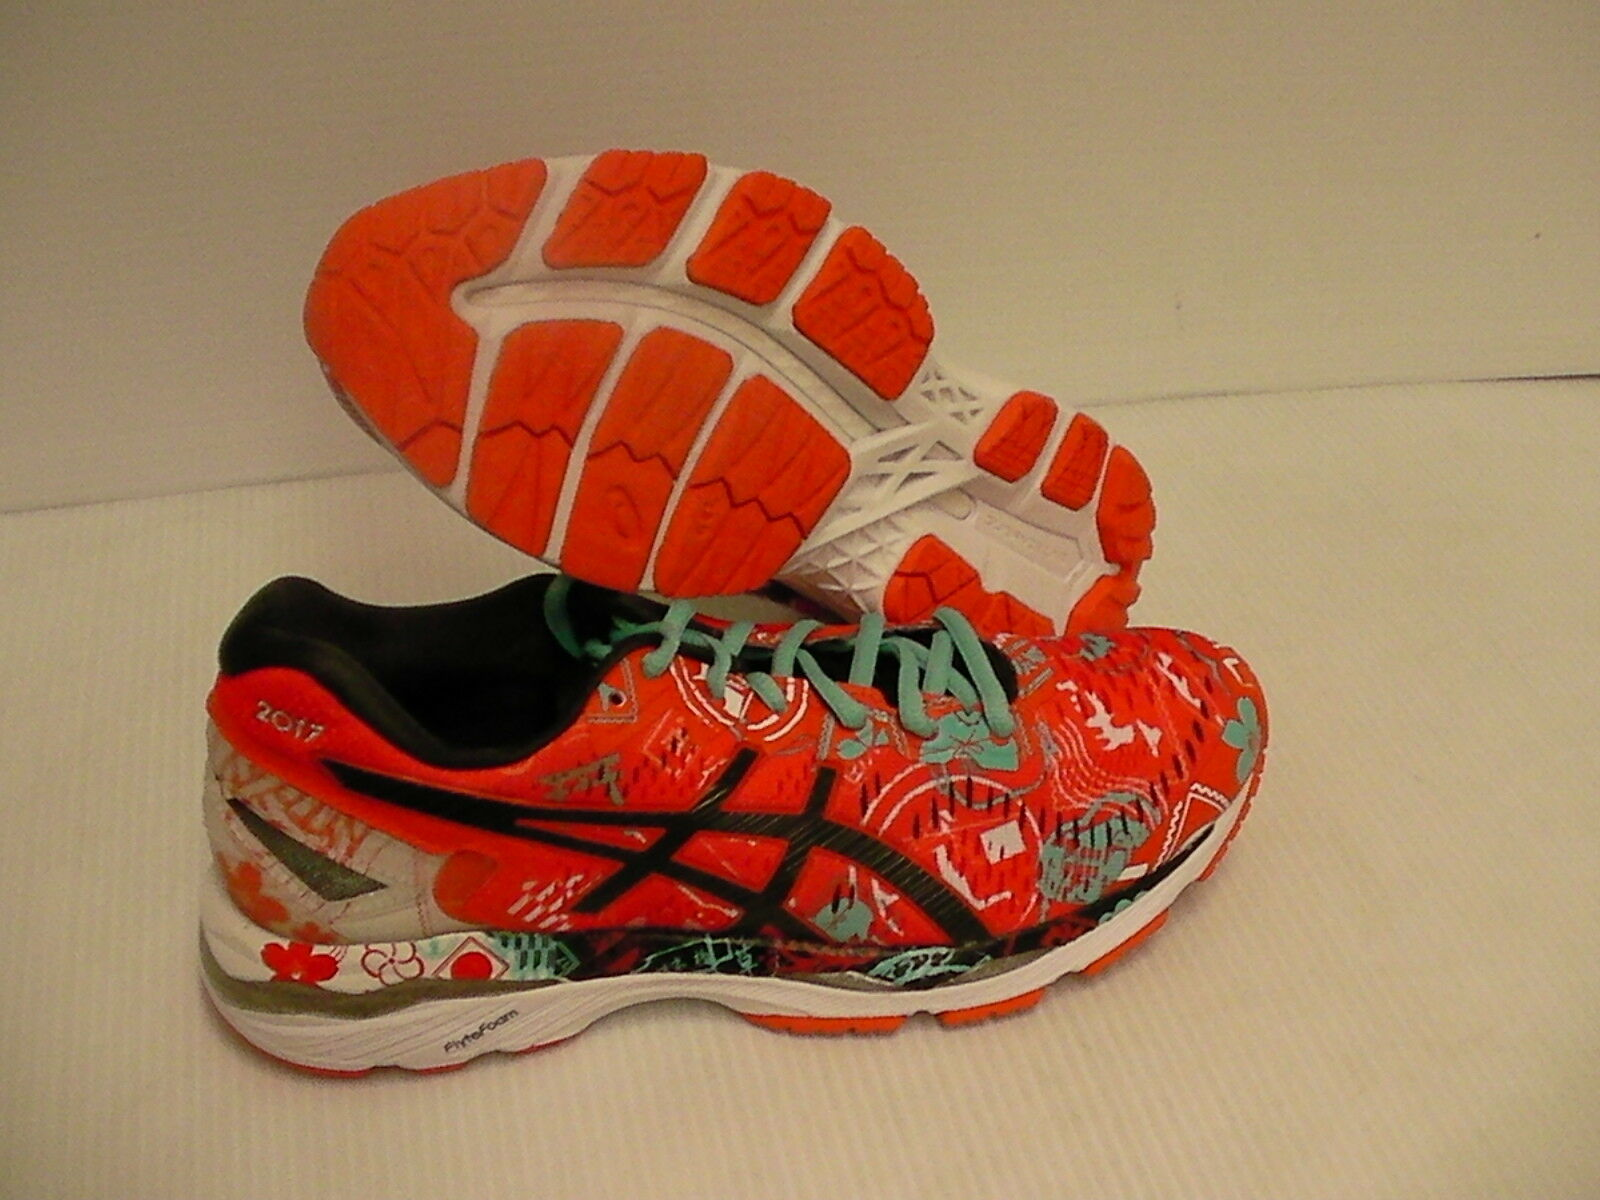 Asics women's gel kayano 23 tokyo running shoes mandarin red size 6.5 us new Casual wild